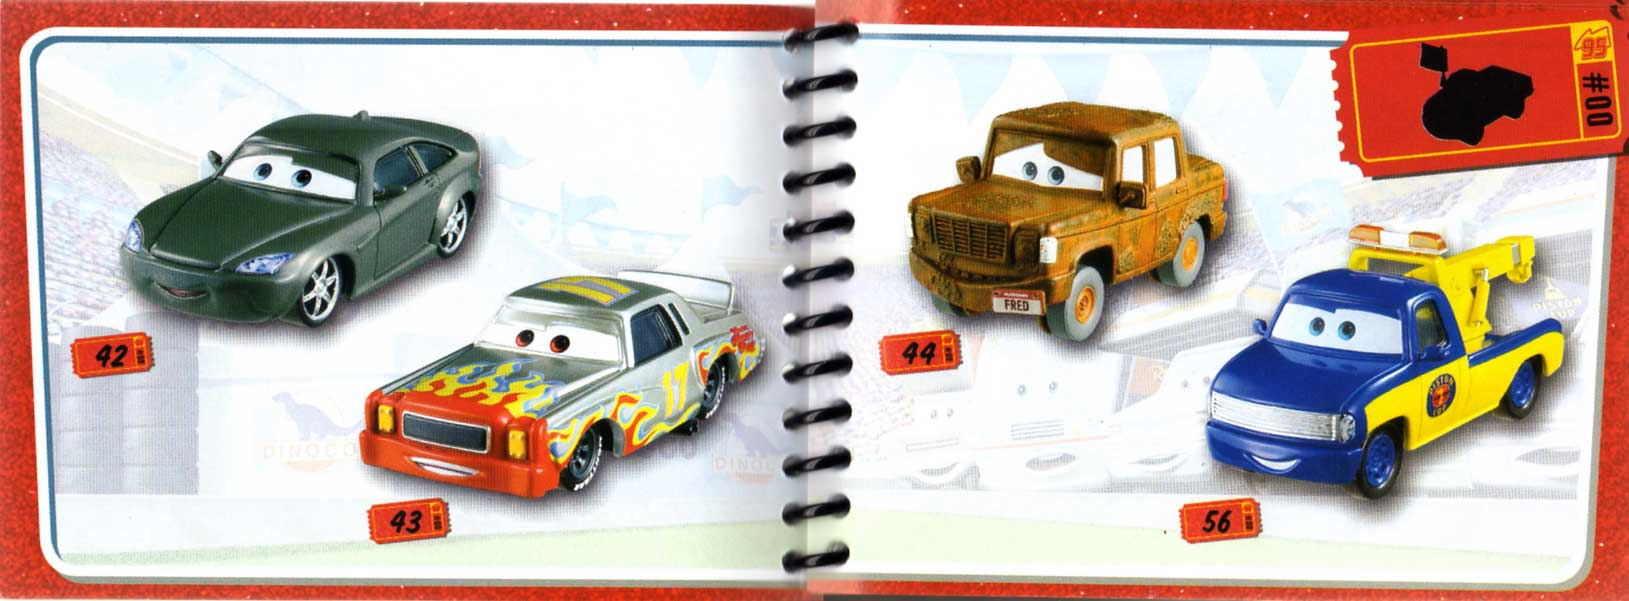 Catalogue Race O Rama page 36 - 37